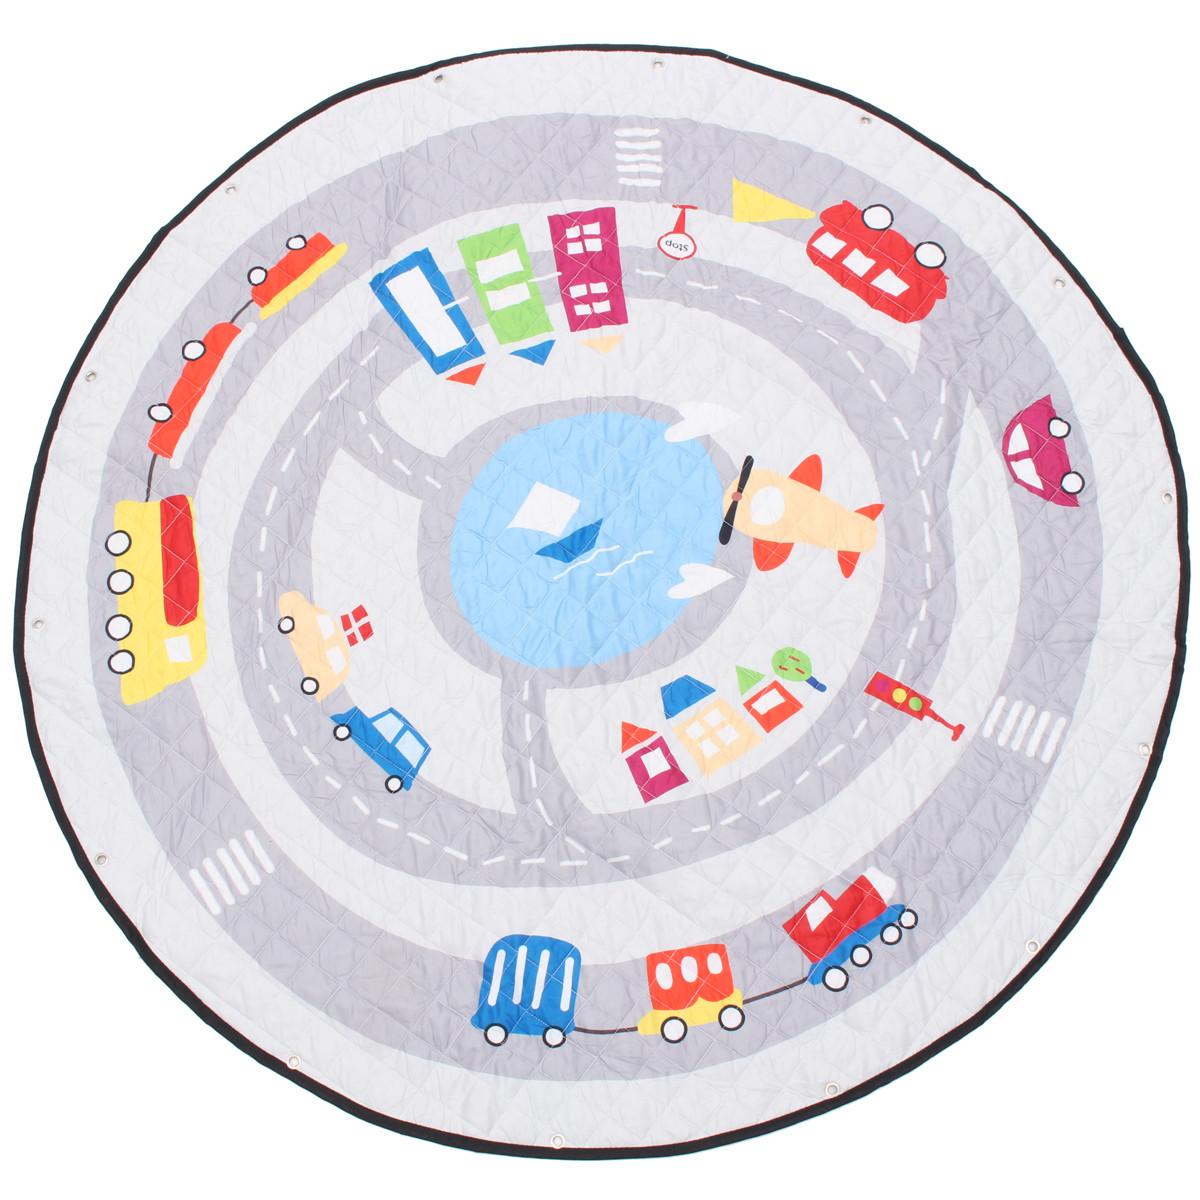 55 '' Soft Cotton Round Baby Kids Game Спортзал Play Crawling Blanket Toys Storage Сумка - 1TopShop